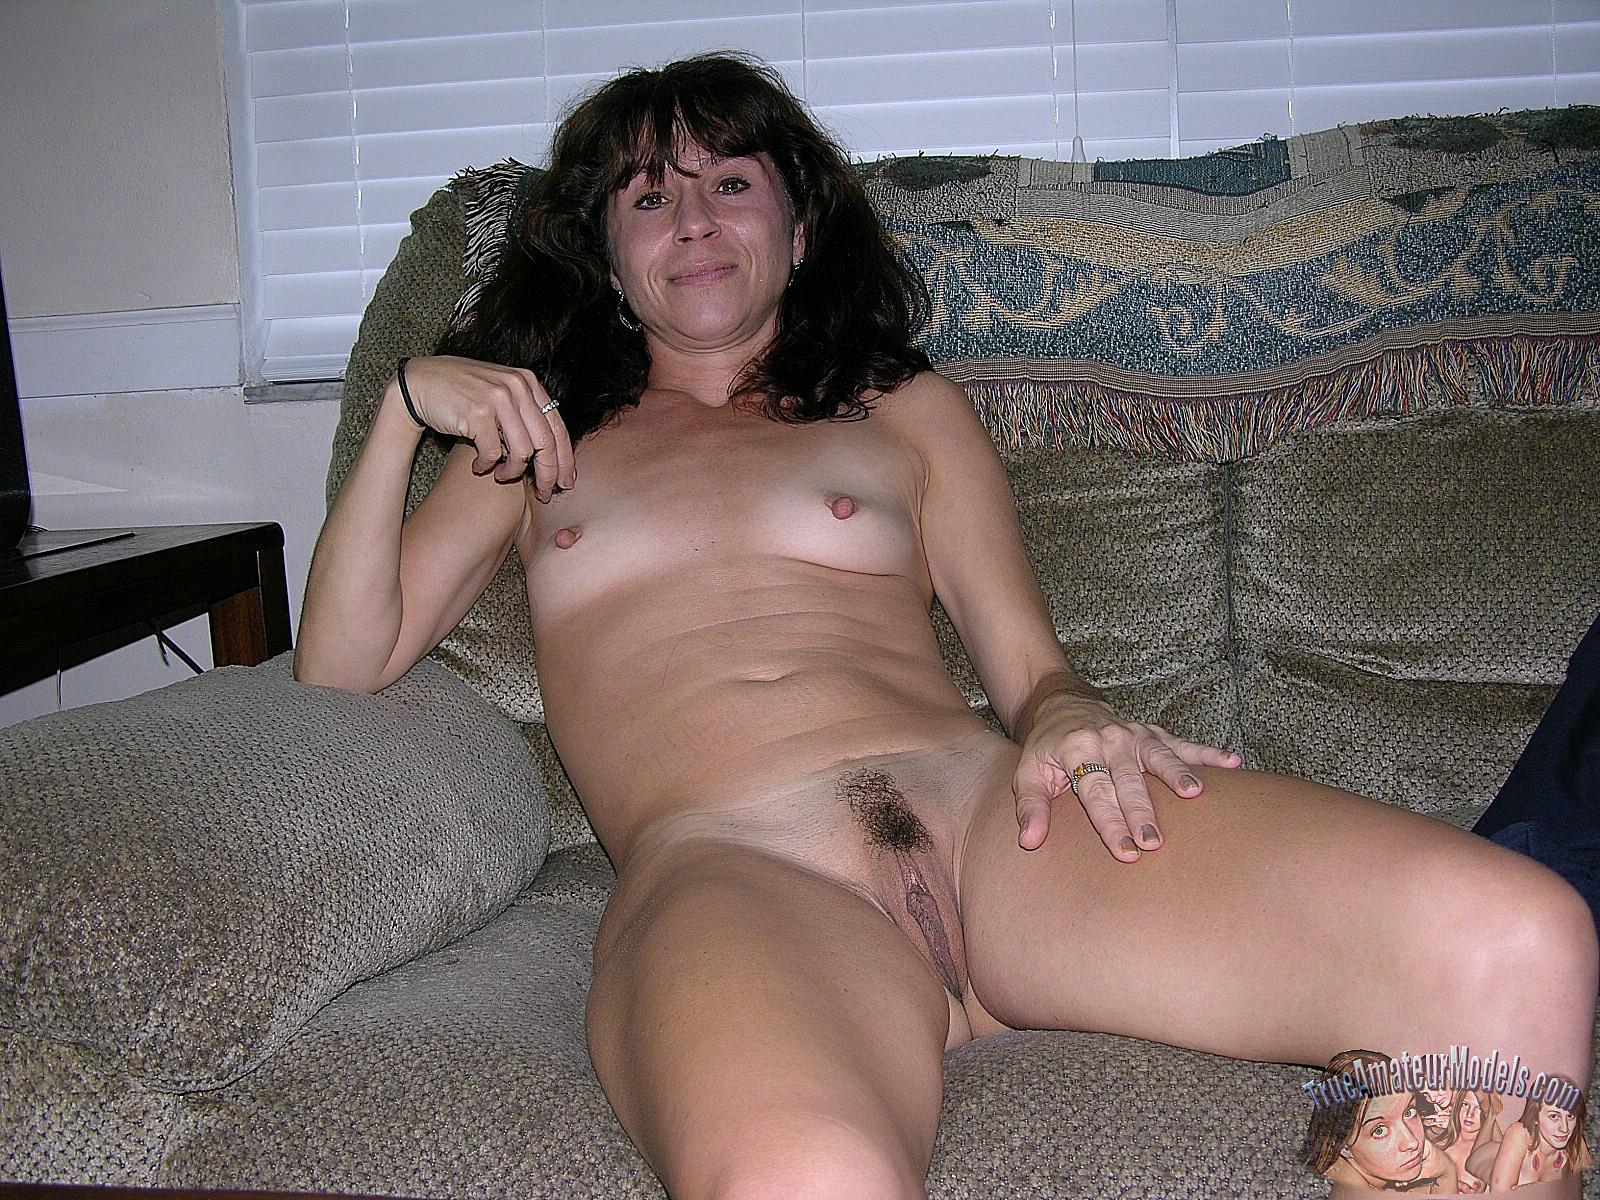 nude mom Amature single